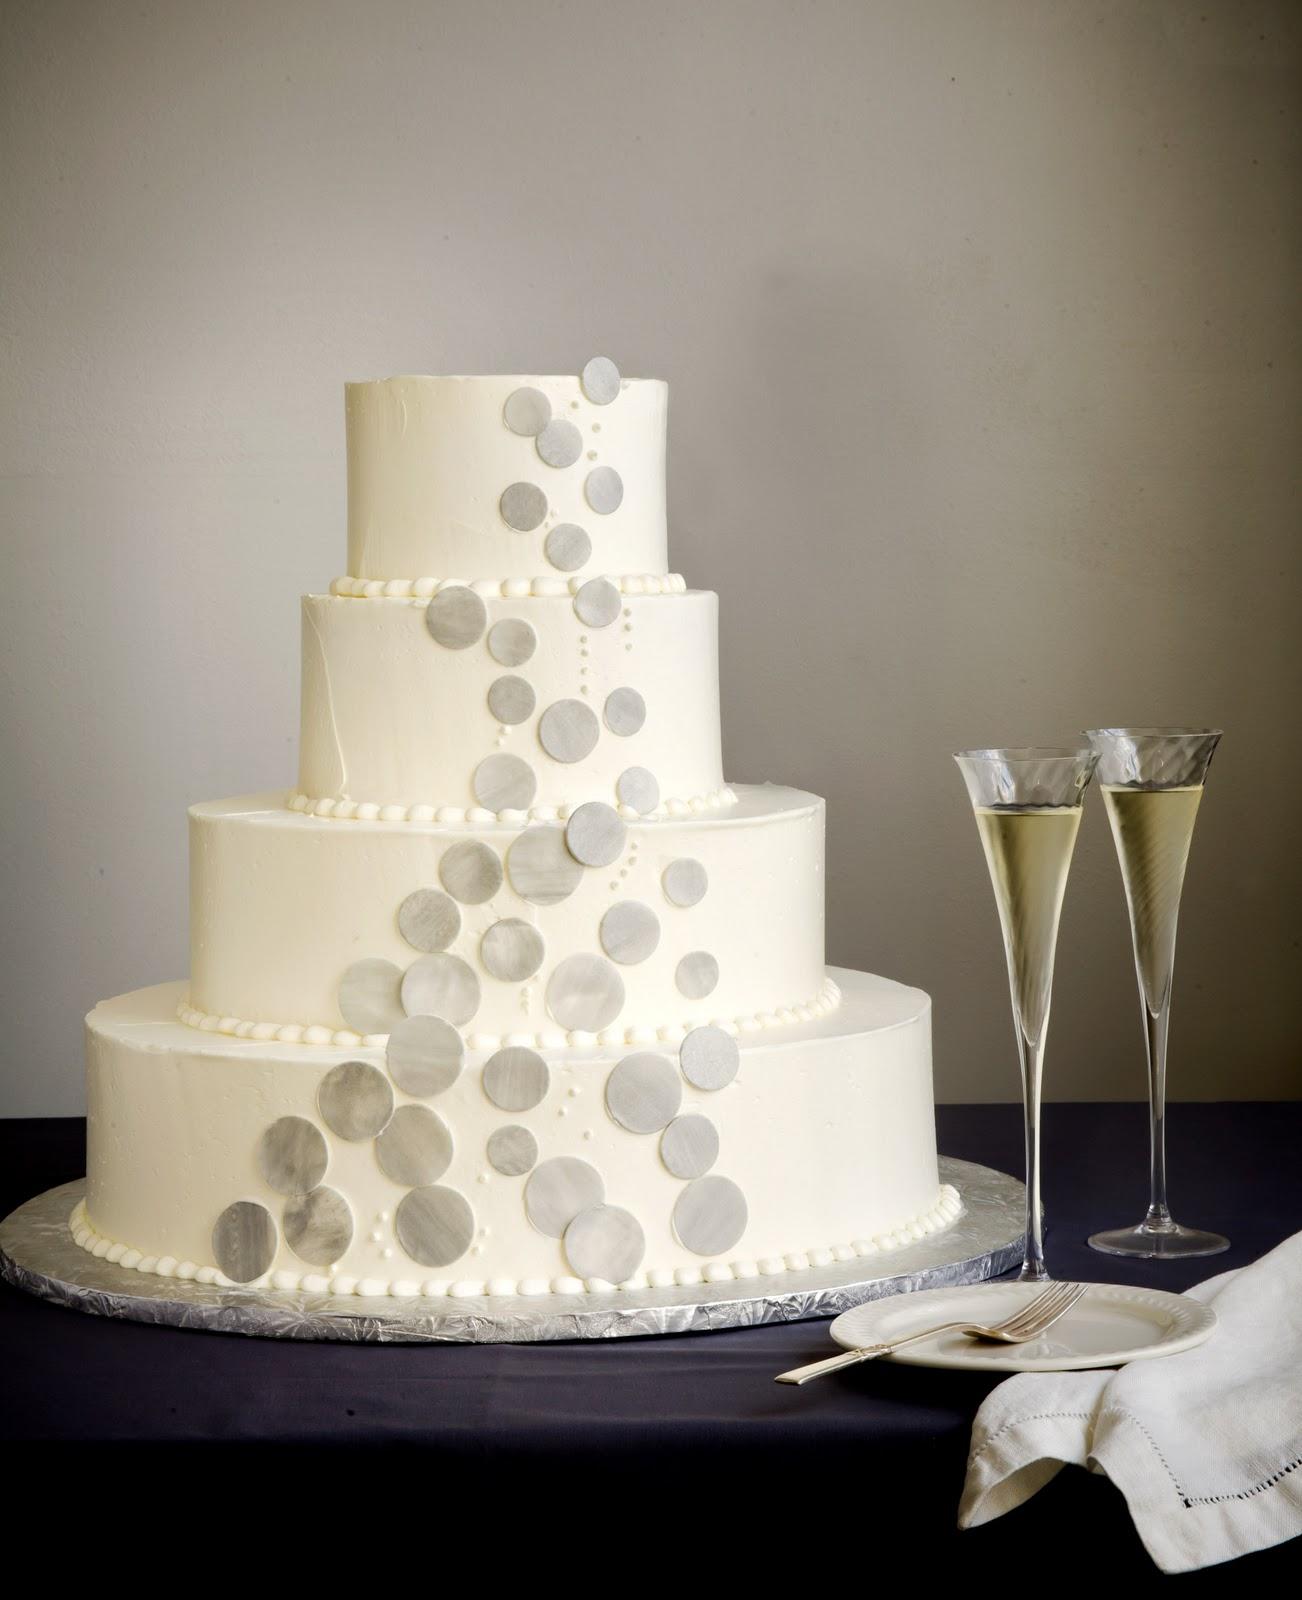 A Simple Cake Three New Wedding Cake Ideas